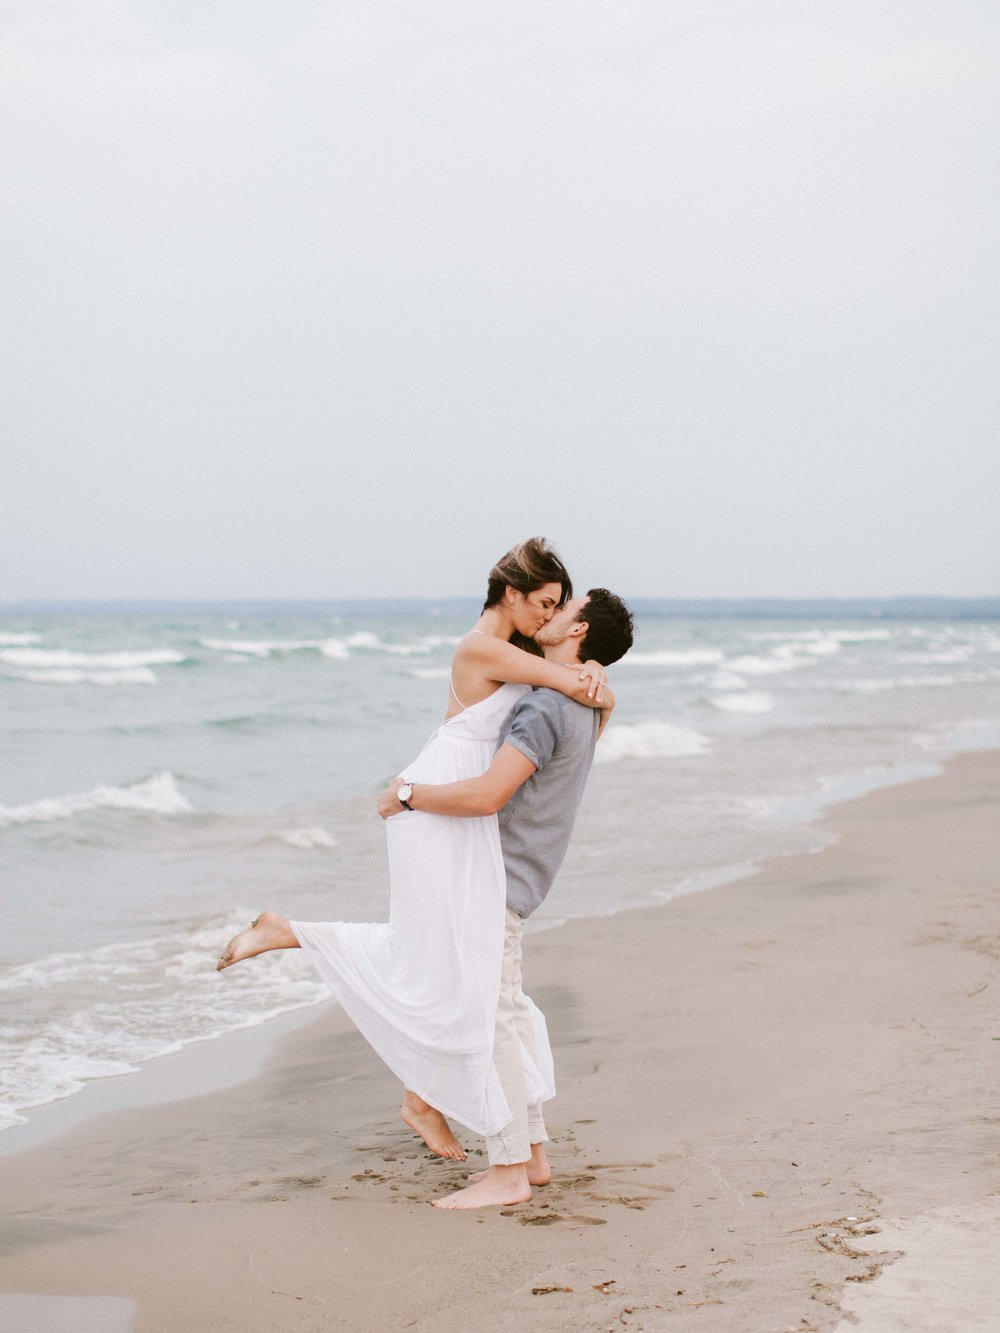 Summer_Engagament_Session_Toronto_Niagara_Wedding_Photographer (54 of 67).jpg